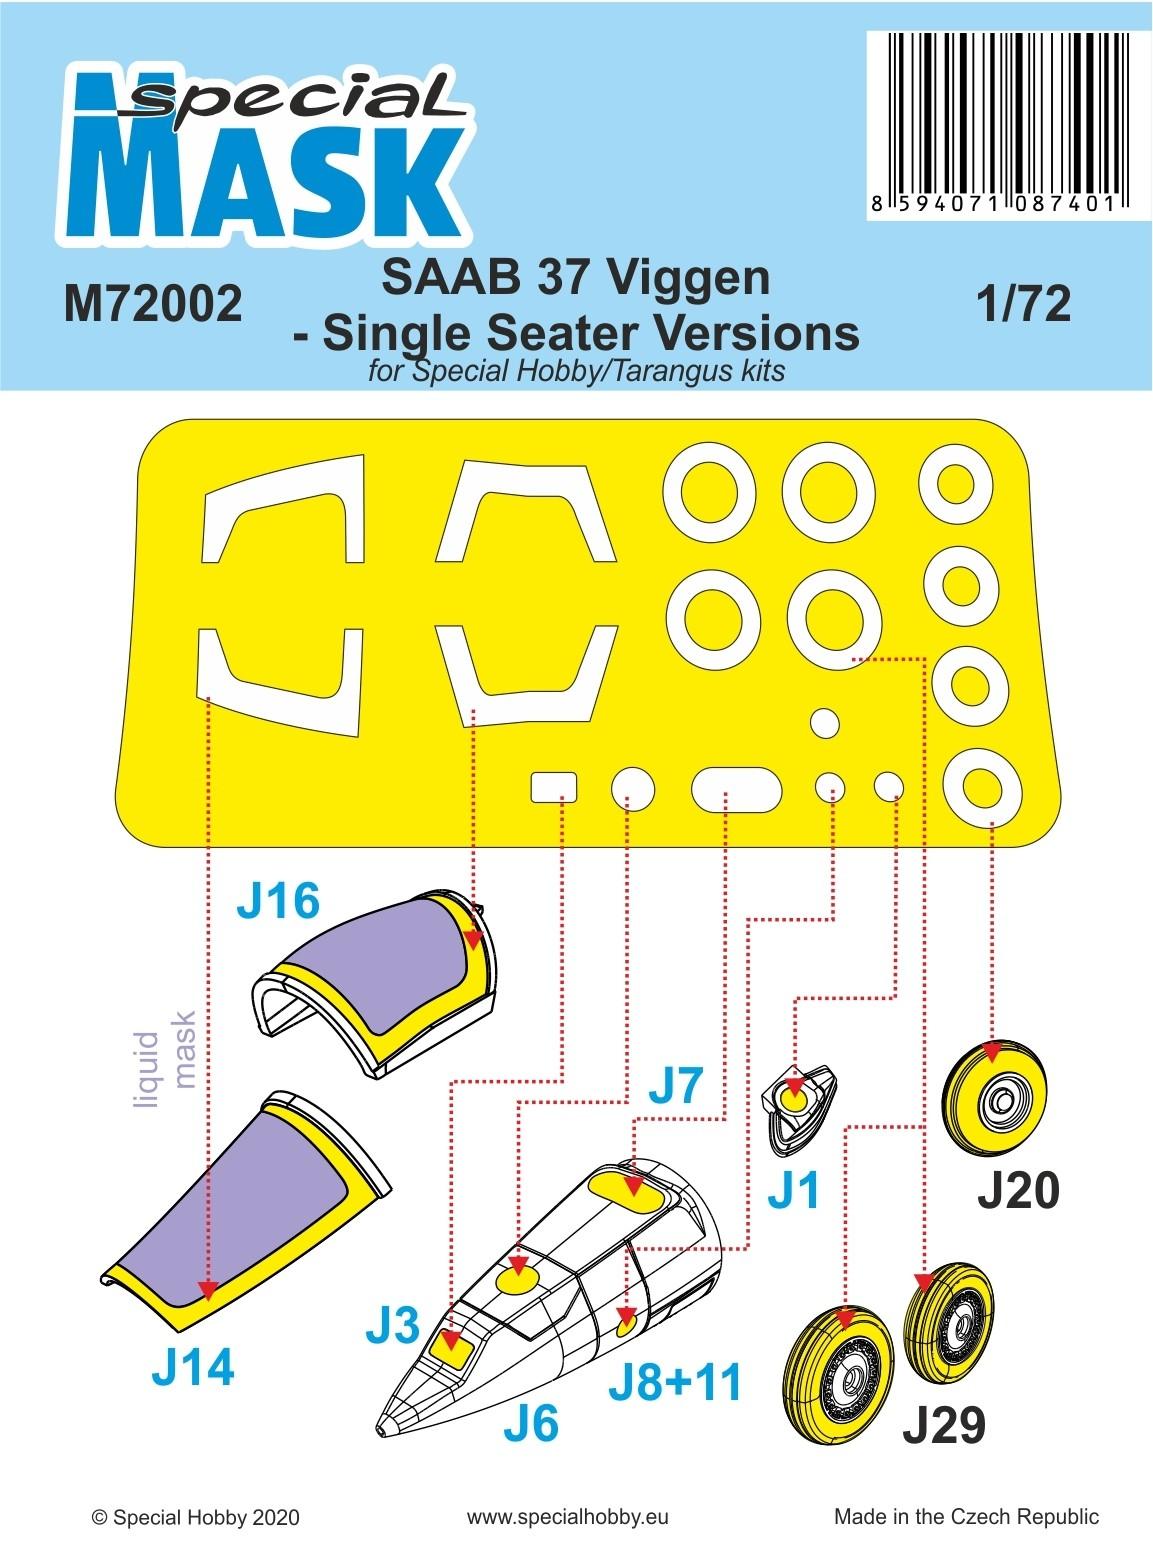 SAAB 37 Viggen single seater paint mask SE INFO